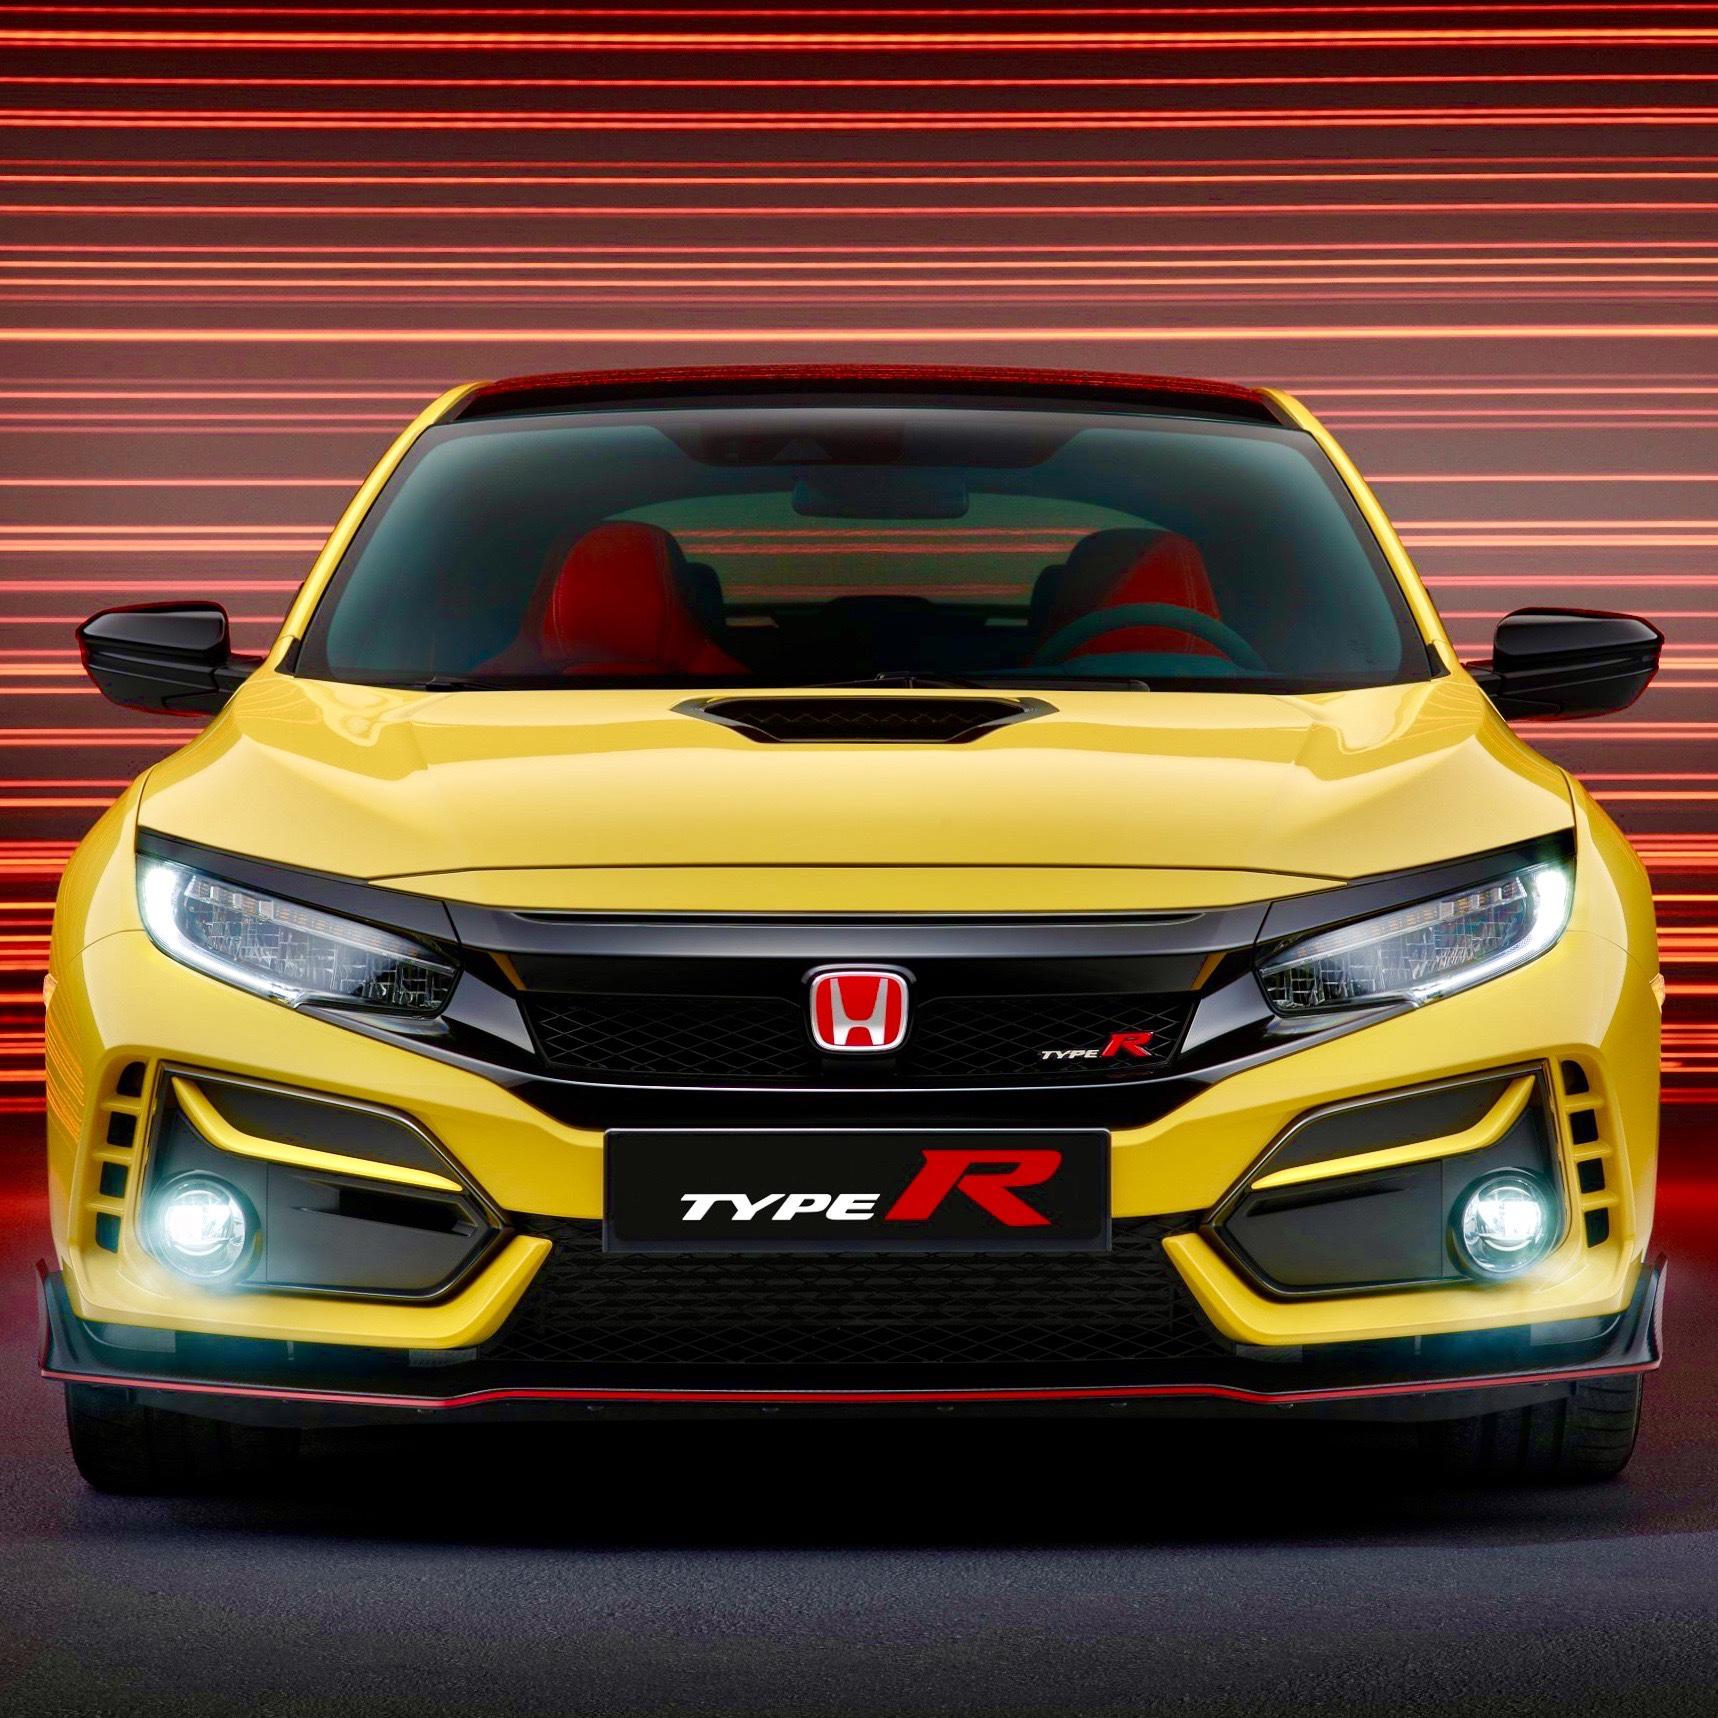 2021 honda civic type r limited edition revealed • hype garage